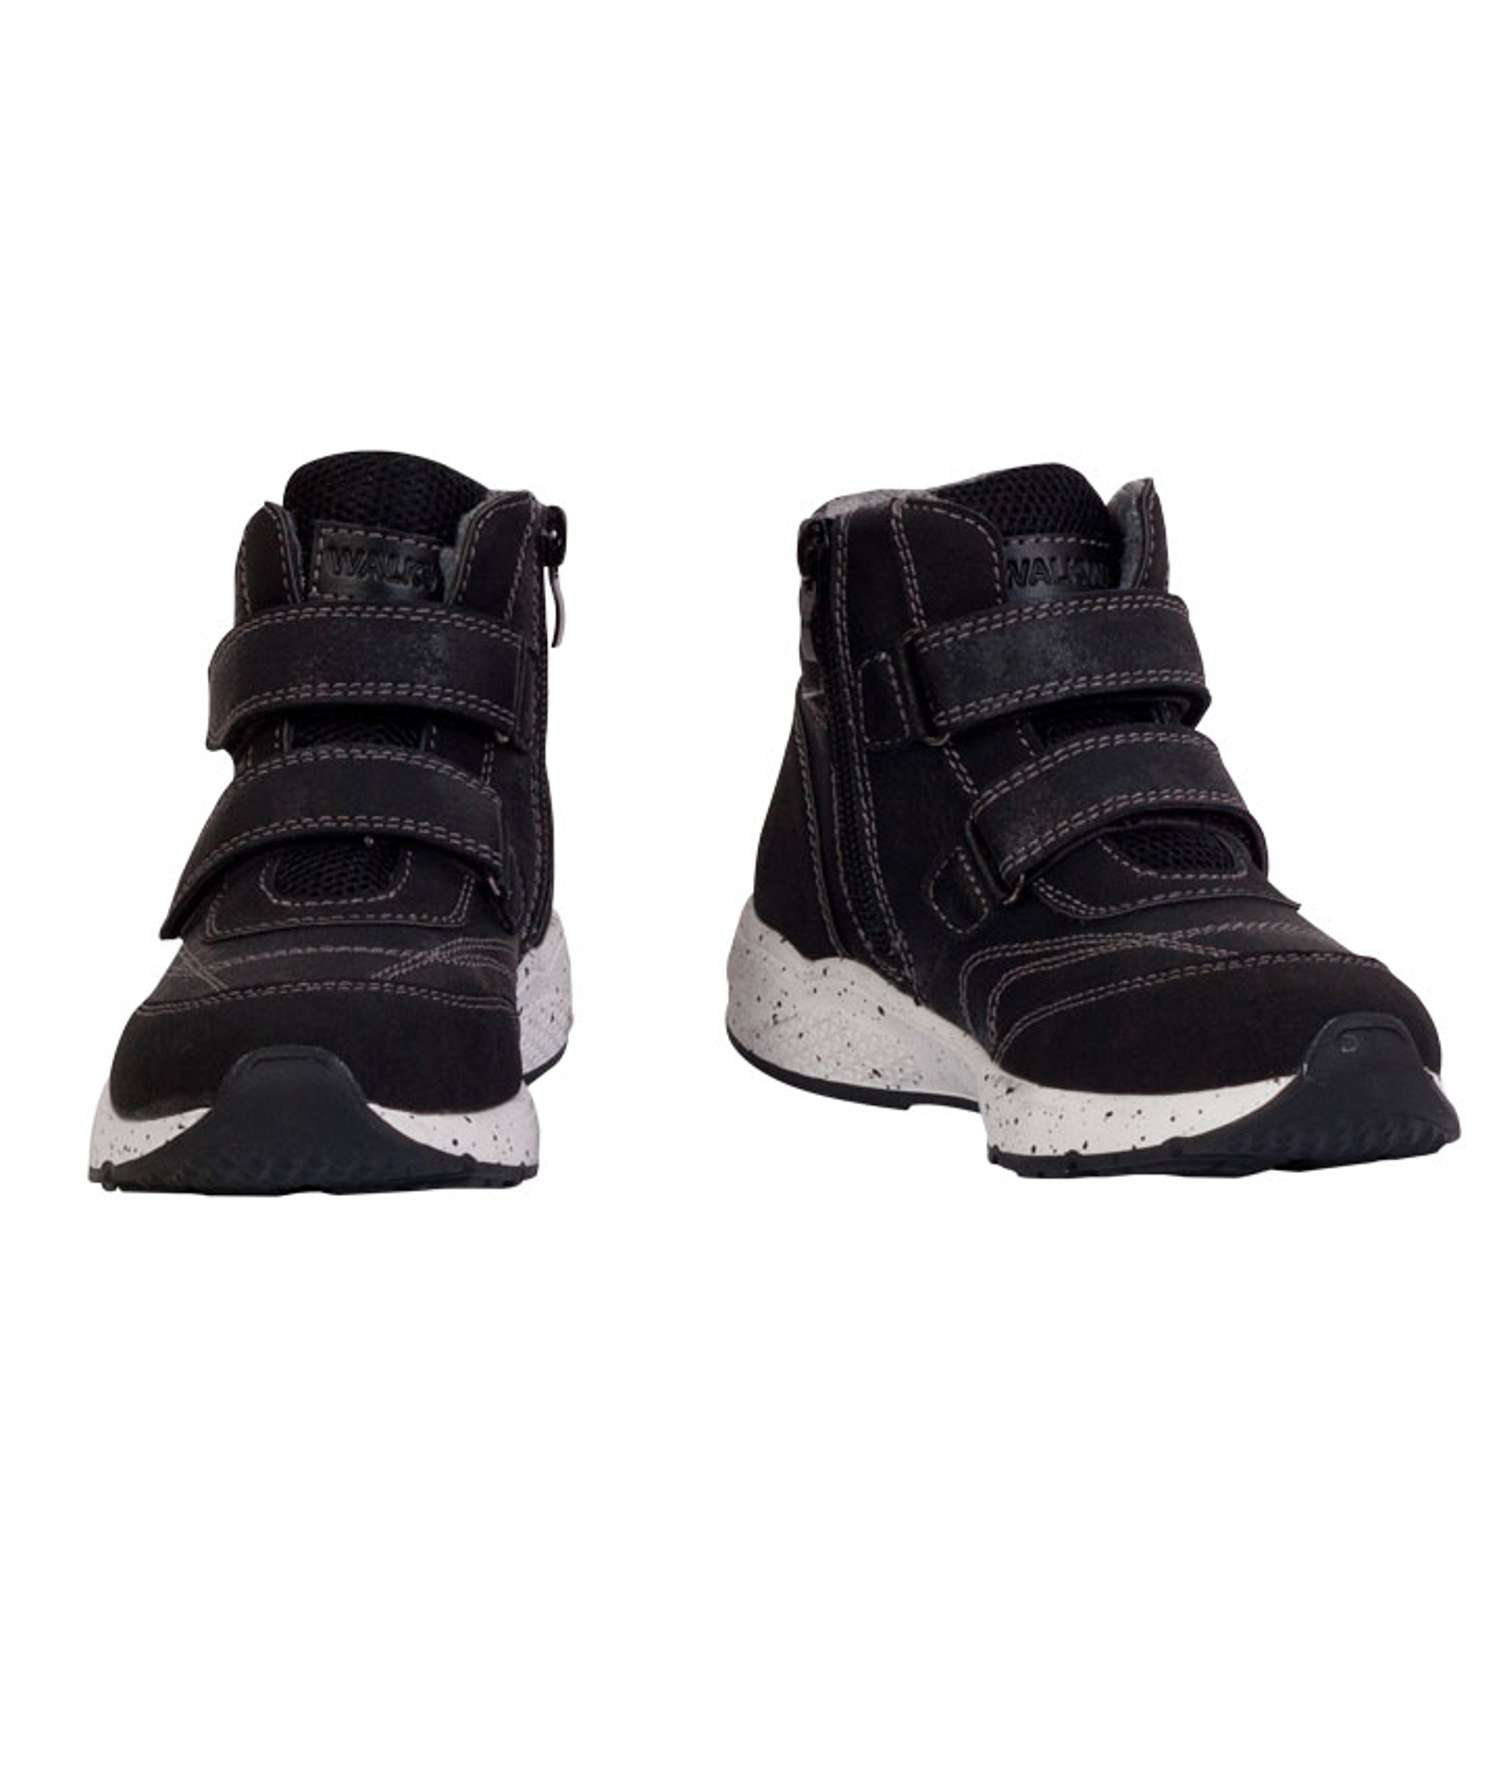 Walkway - Akako børne vinter sneakers - Sort - Størrelse 35